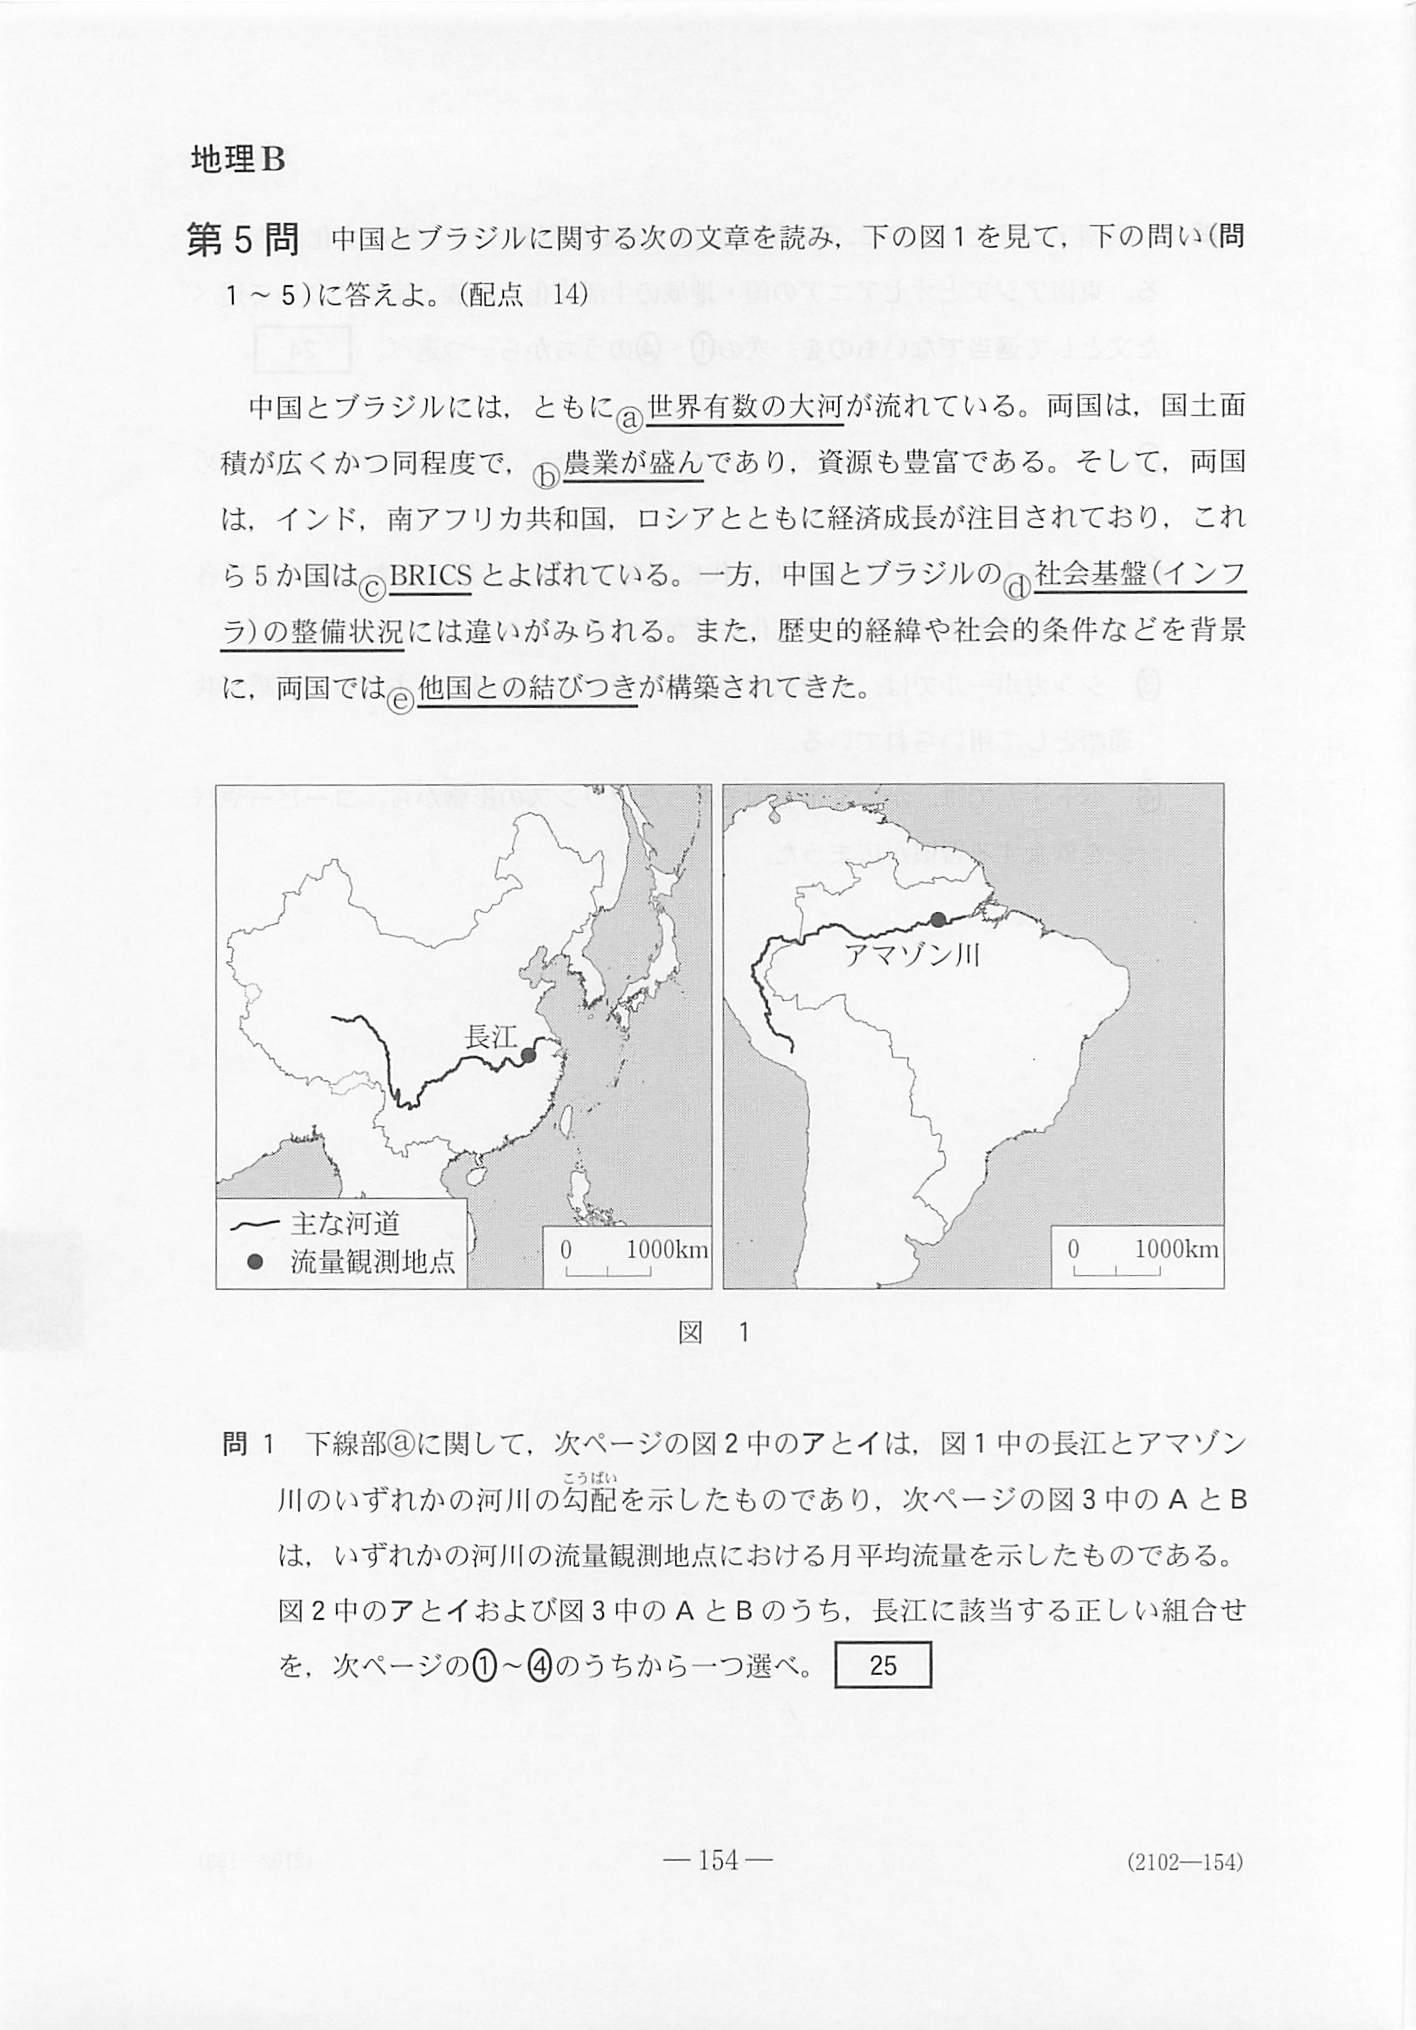 地理B 地理歴史|2020年 令和2年 センター試験過去問題